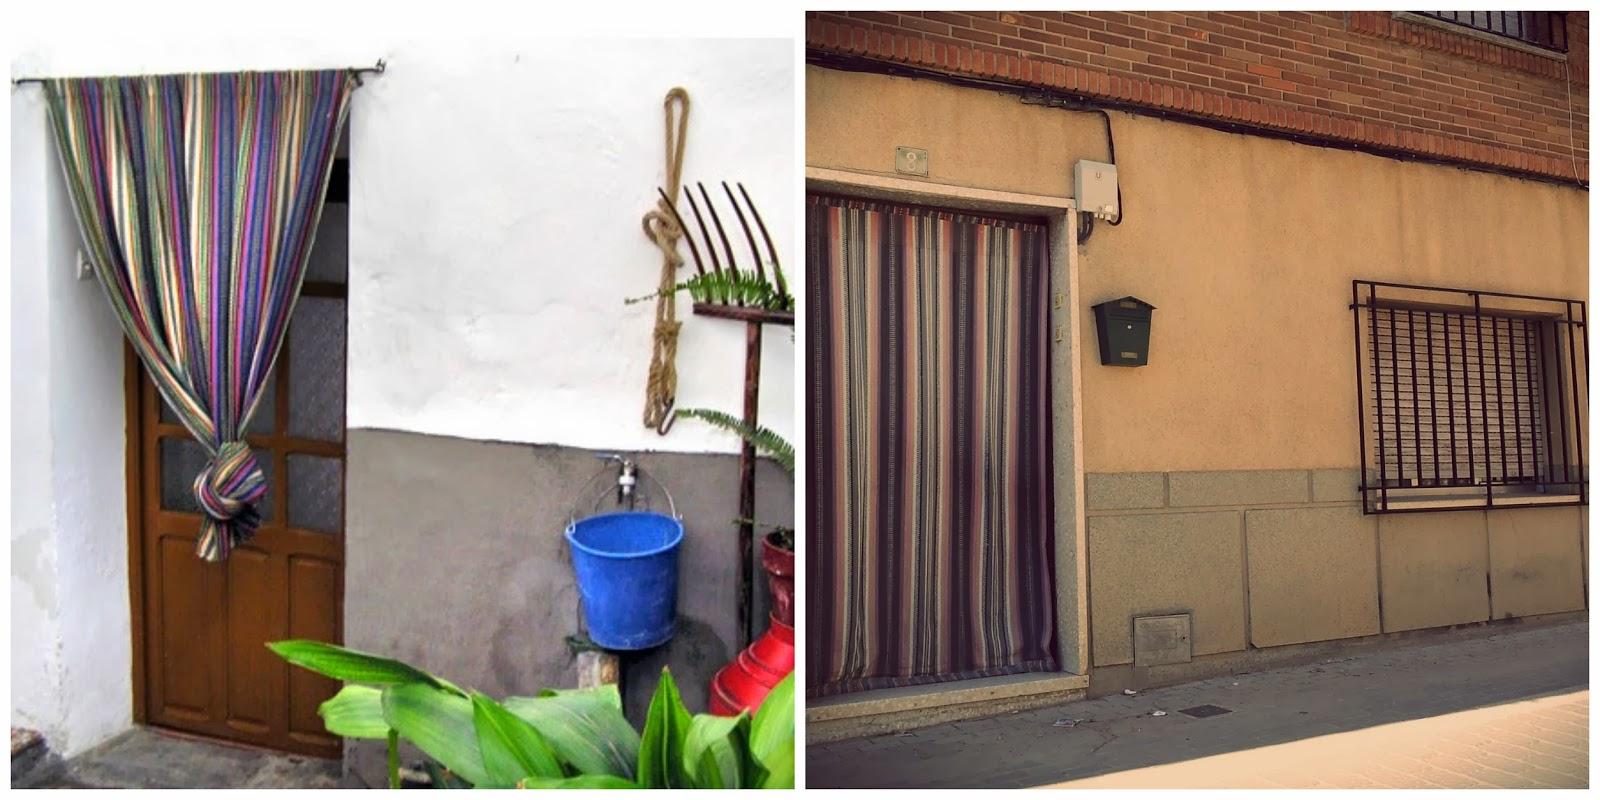 Cortinas de puertas exteriores dise os arquitect nicos for Cortinas exteriores